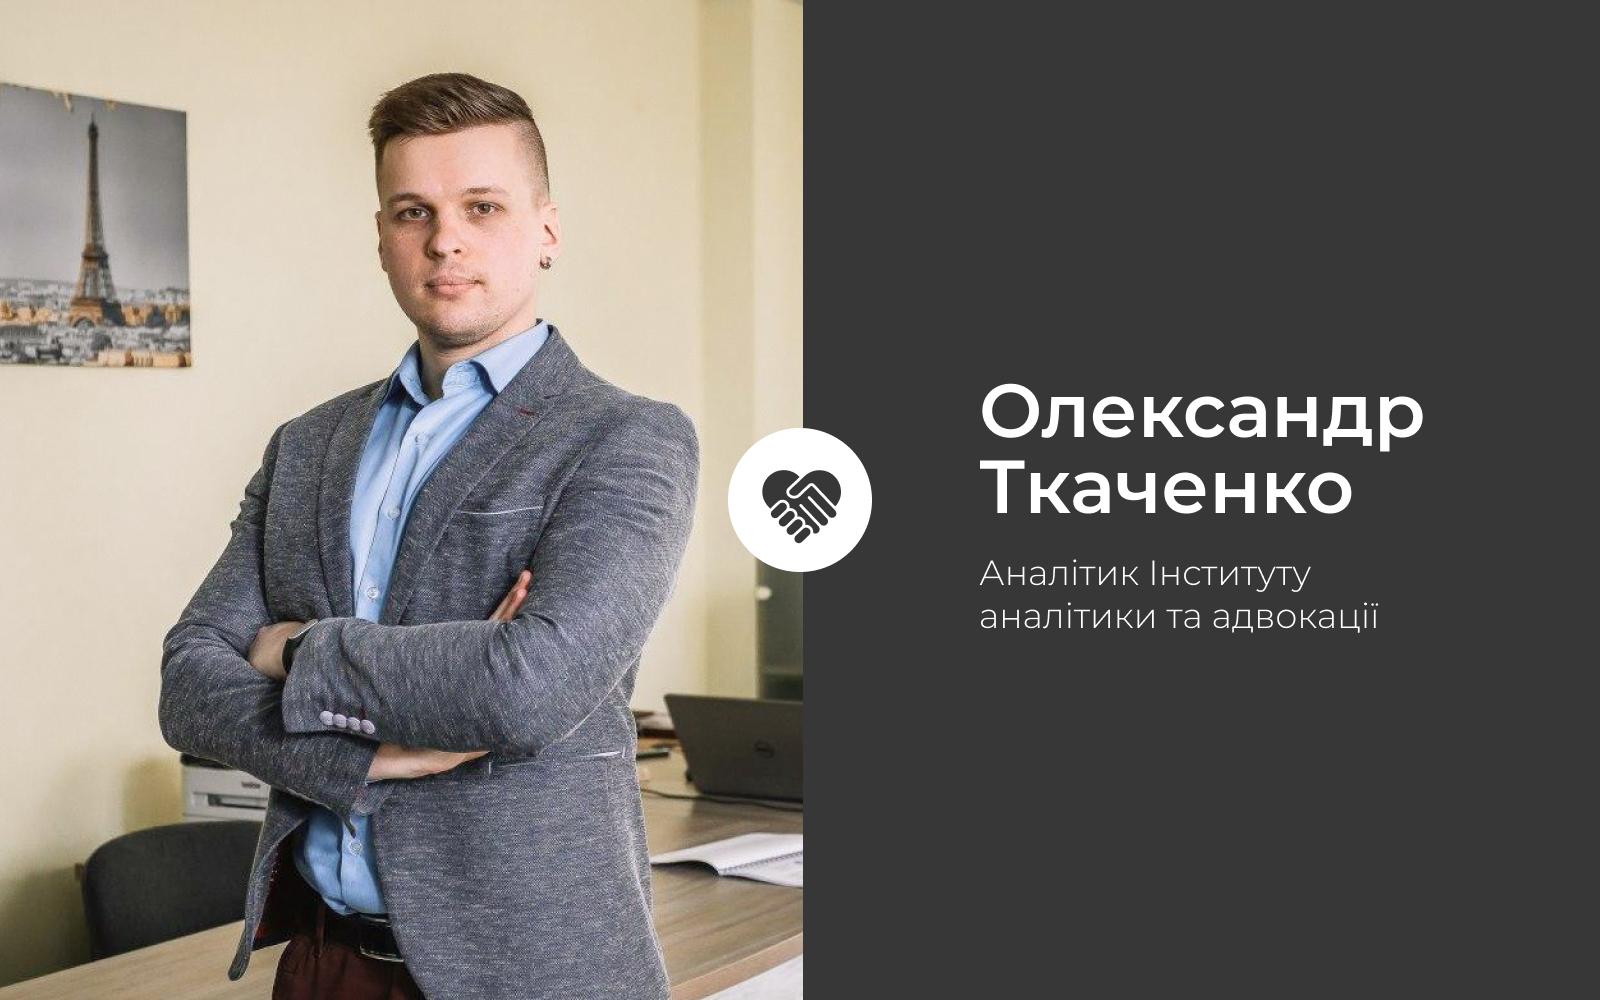 Alexander Tkachenko